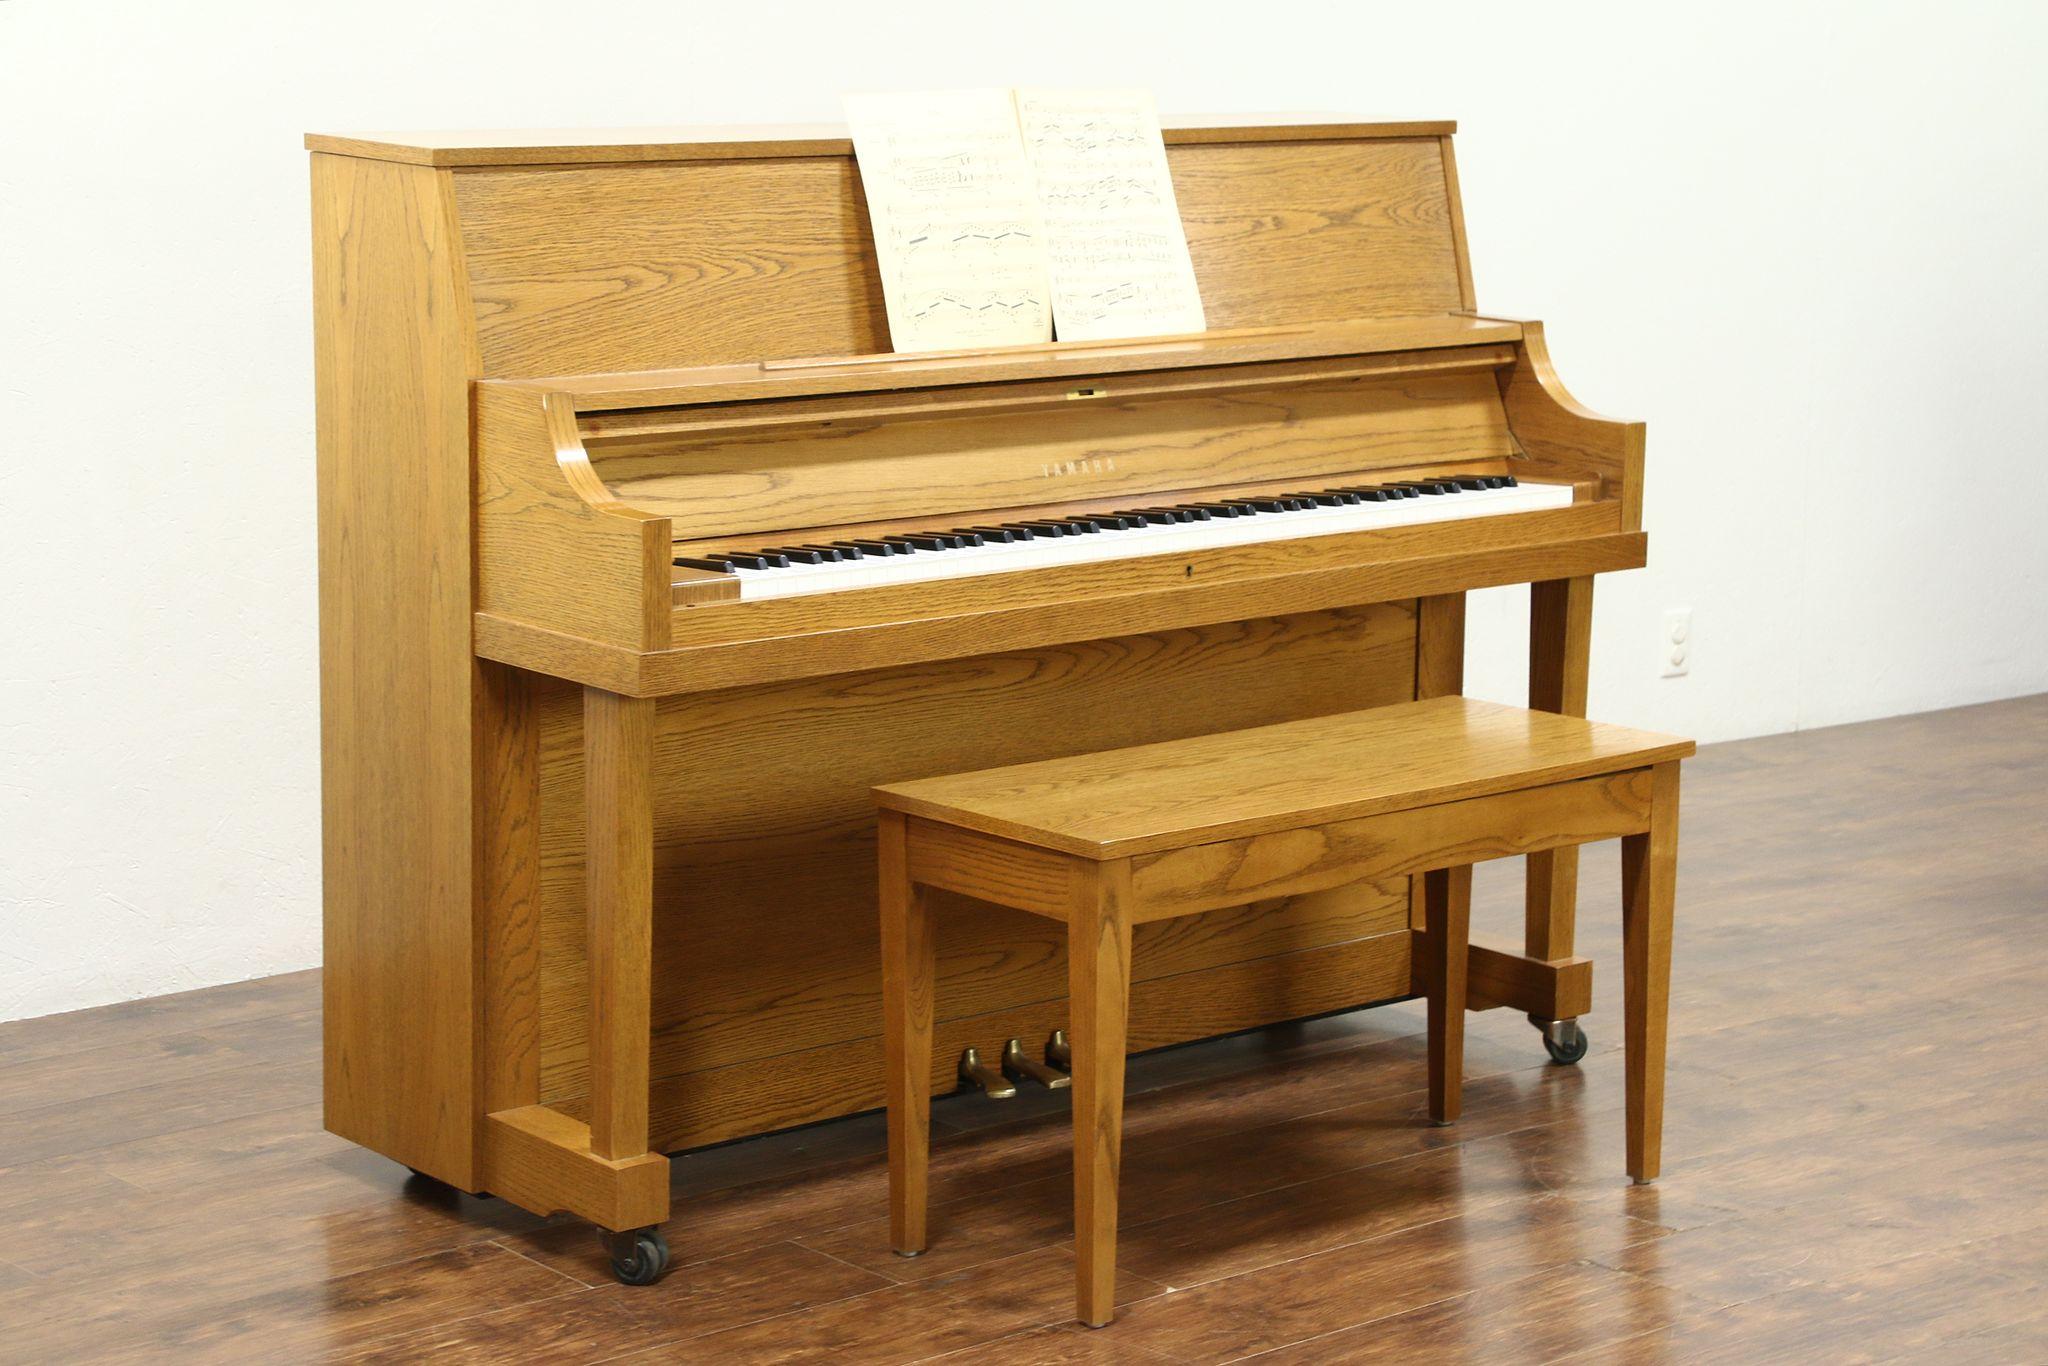 sold yamaha 45 upright oak 1995 model p22 piano bench 28637 harp gallery antiques. Black Bedroom Furniture Sets. Home Design Ideas